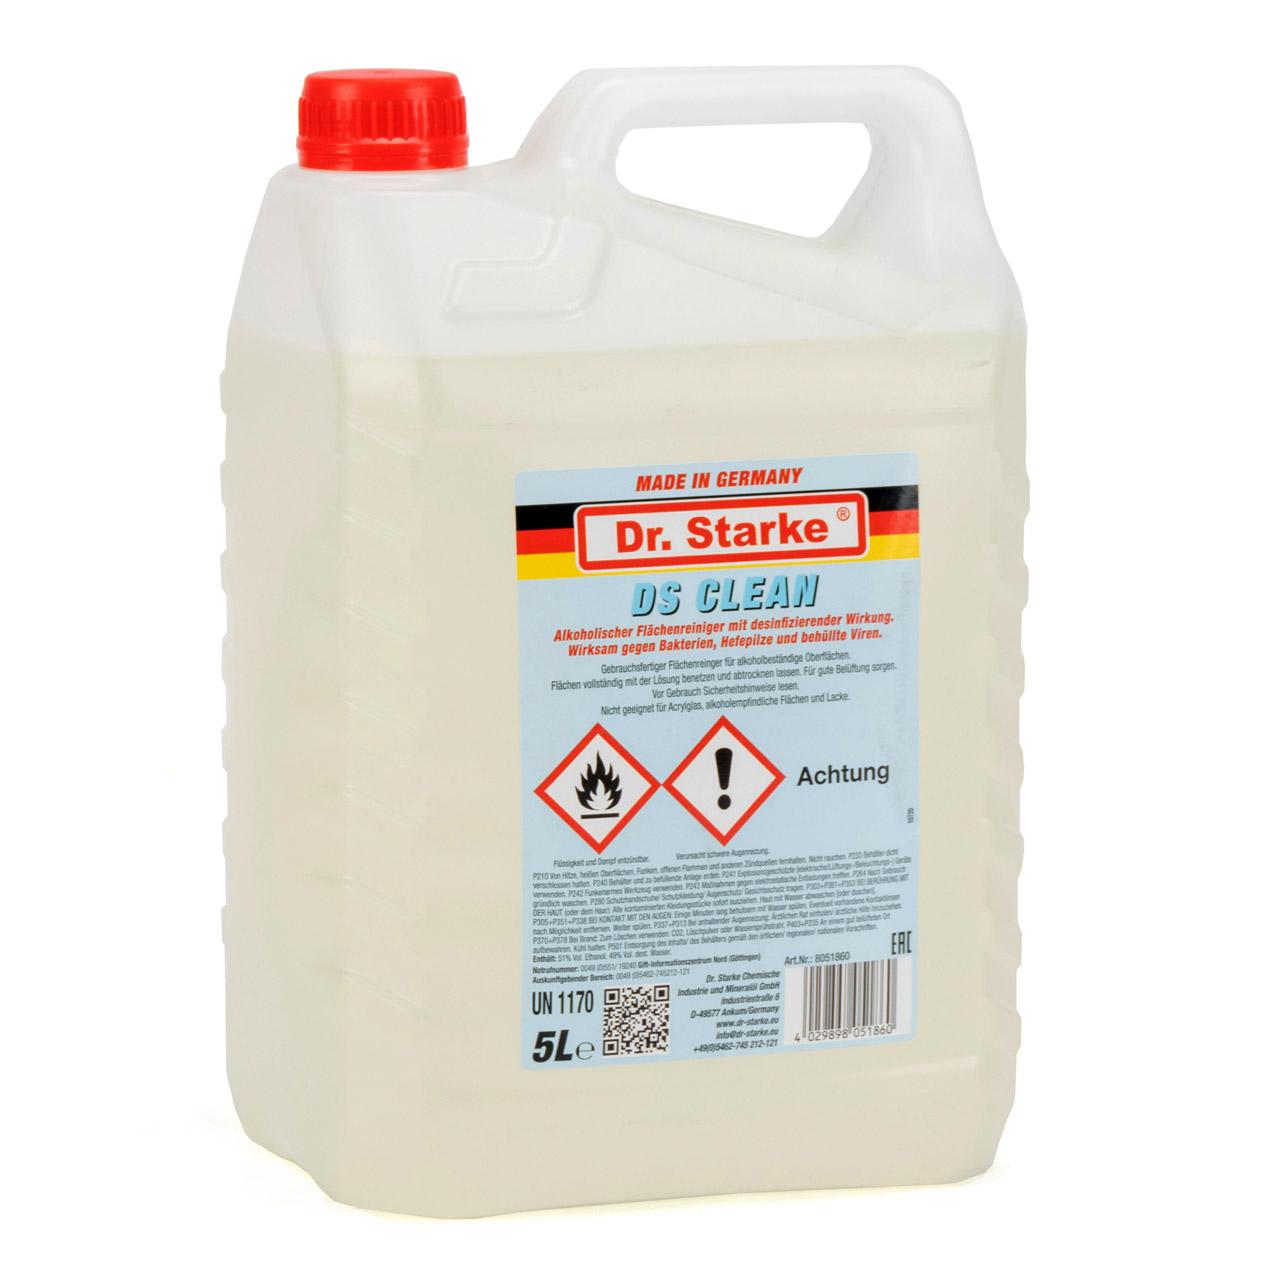 Dr. Starke Desinfektionsmittel Flächendesinfektion Schnelldesinfektion 5 Liter